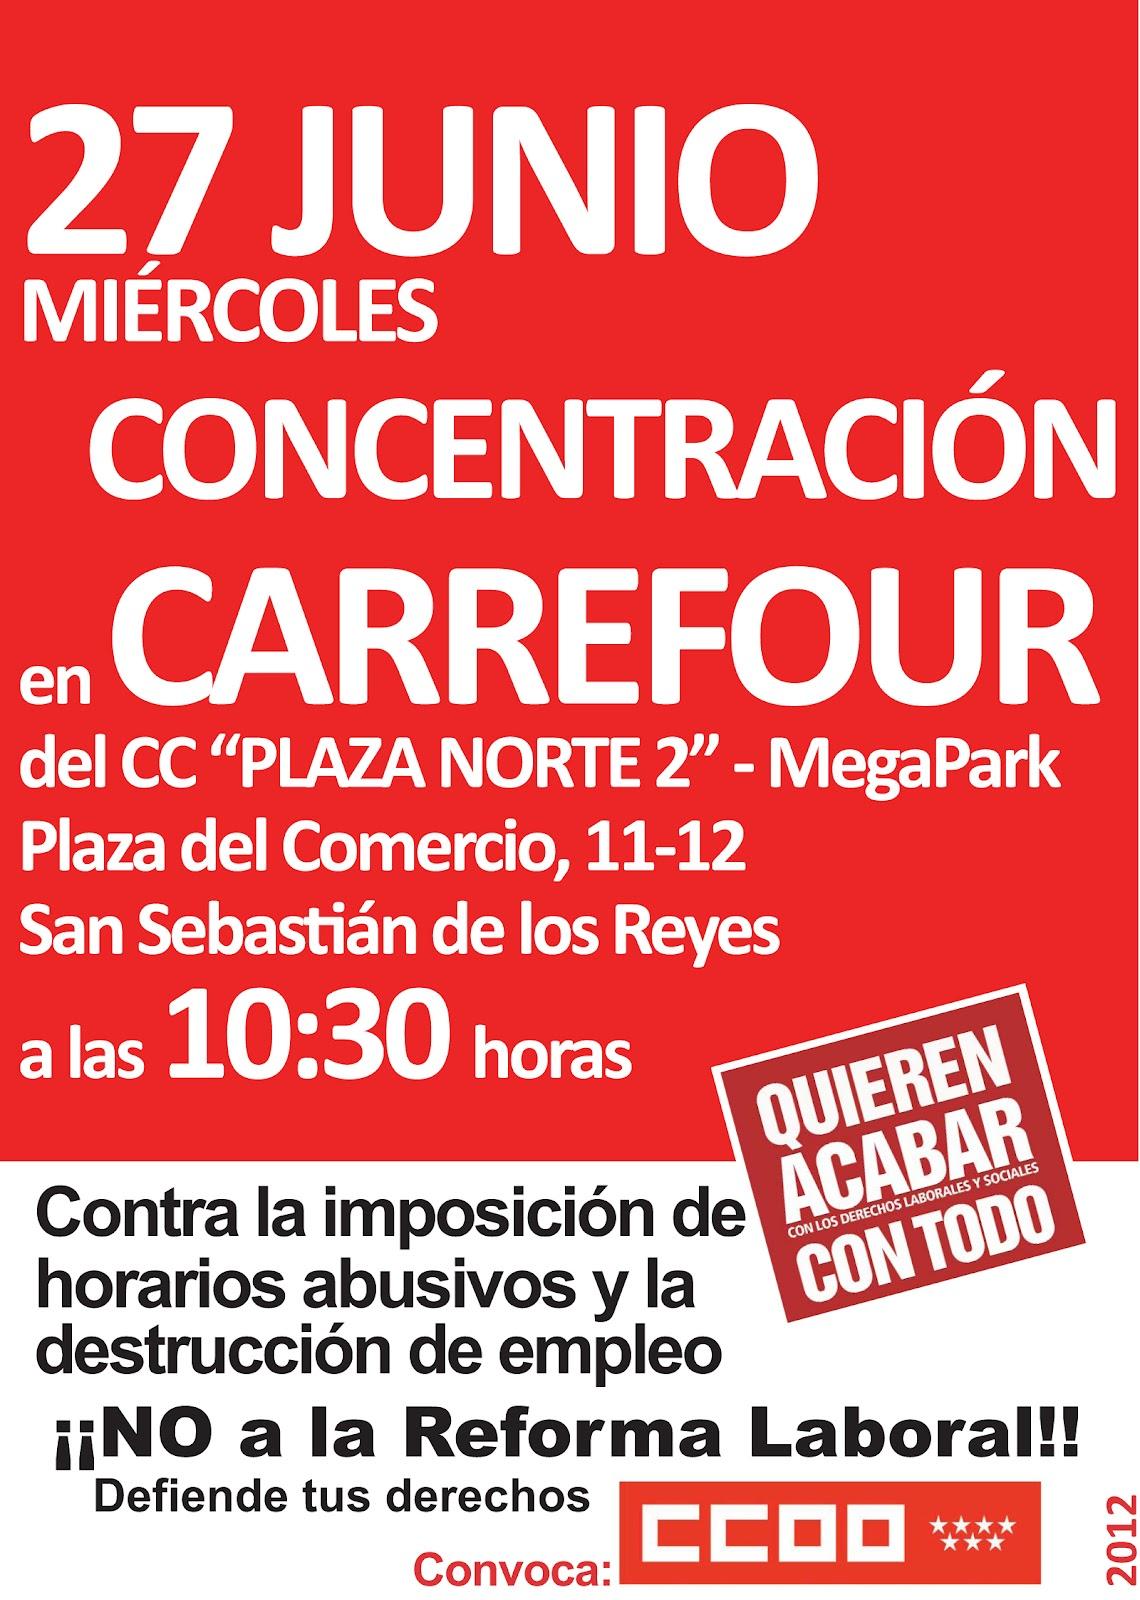 Sec sindical estatal ccoo carrefour junio 2012 - Cc plaza norte majadahonda ...